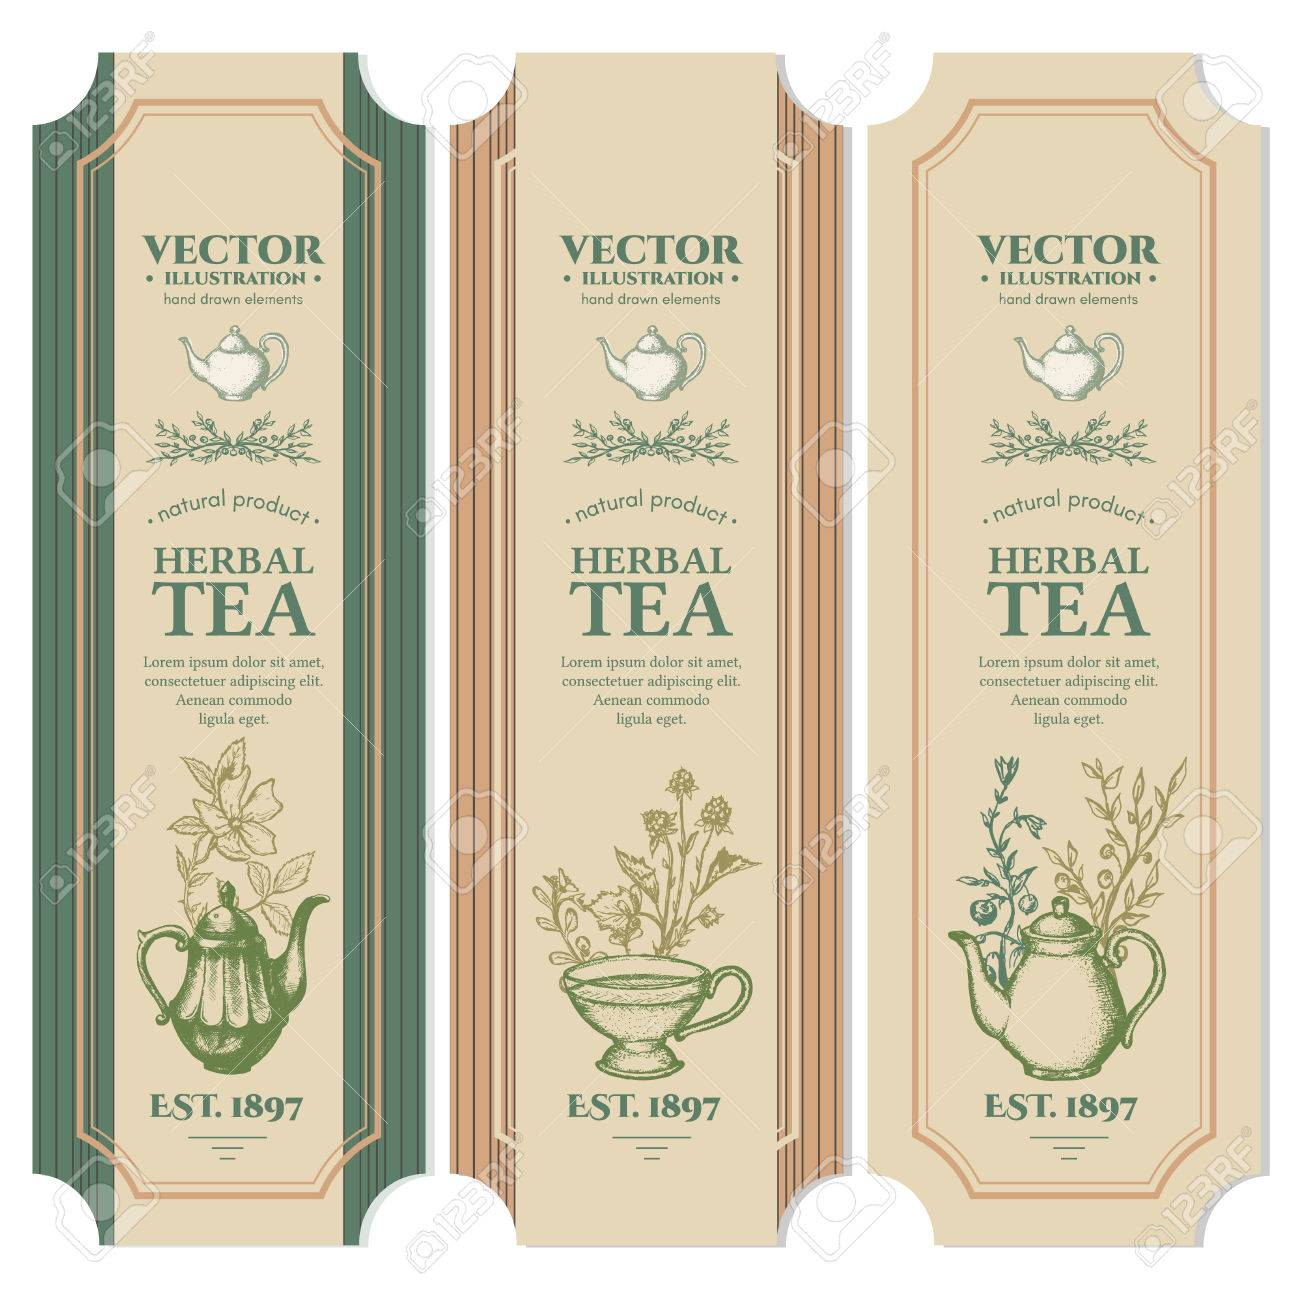 Labels Herbal tea design ink hand drawn vector - 63050074